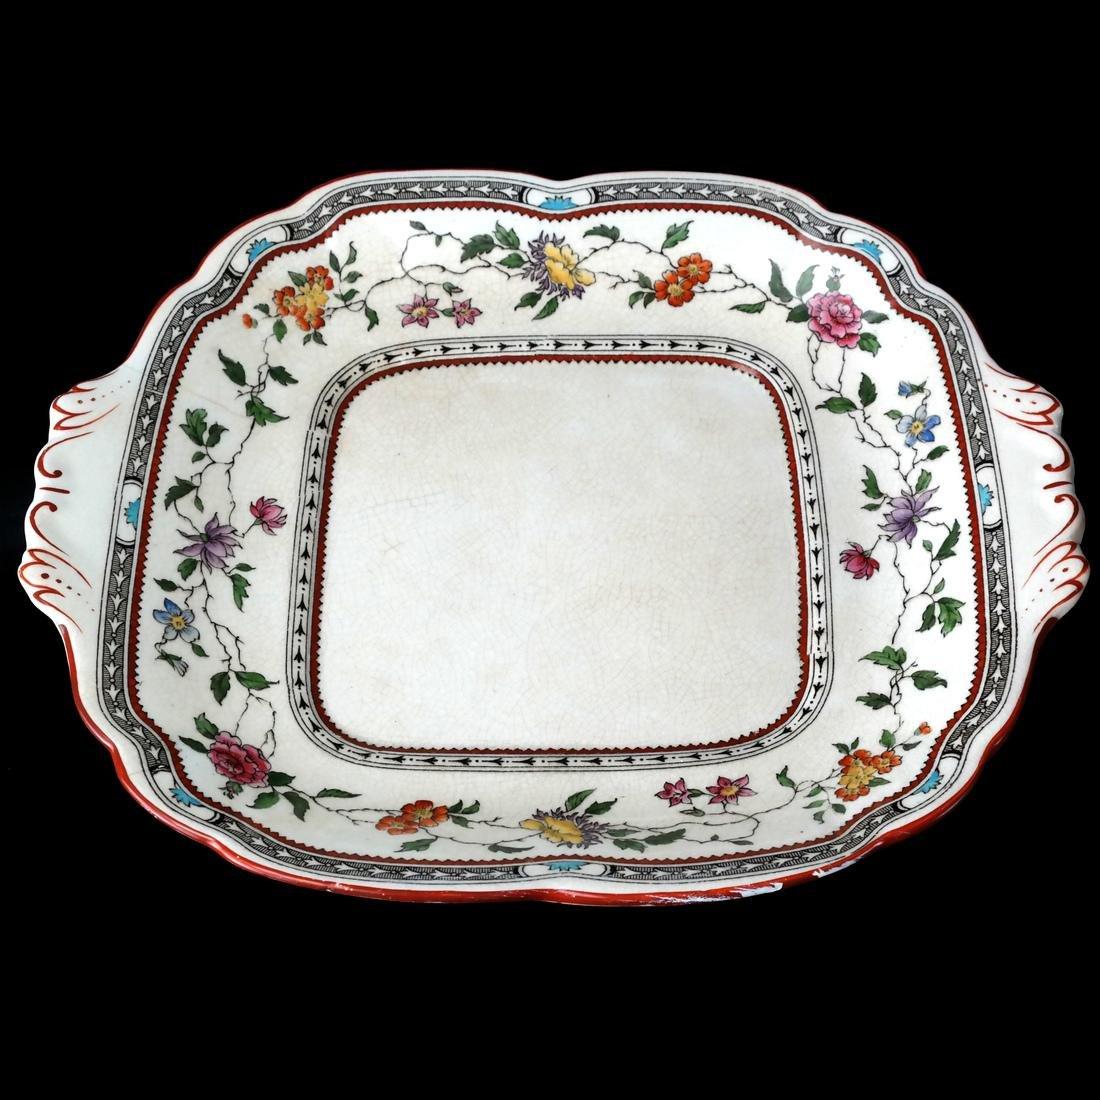 13 Cauldon England Plates - 2